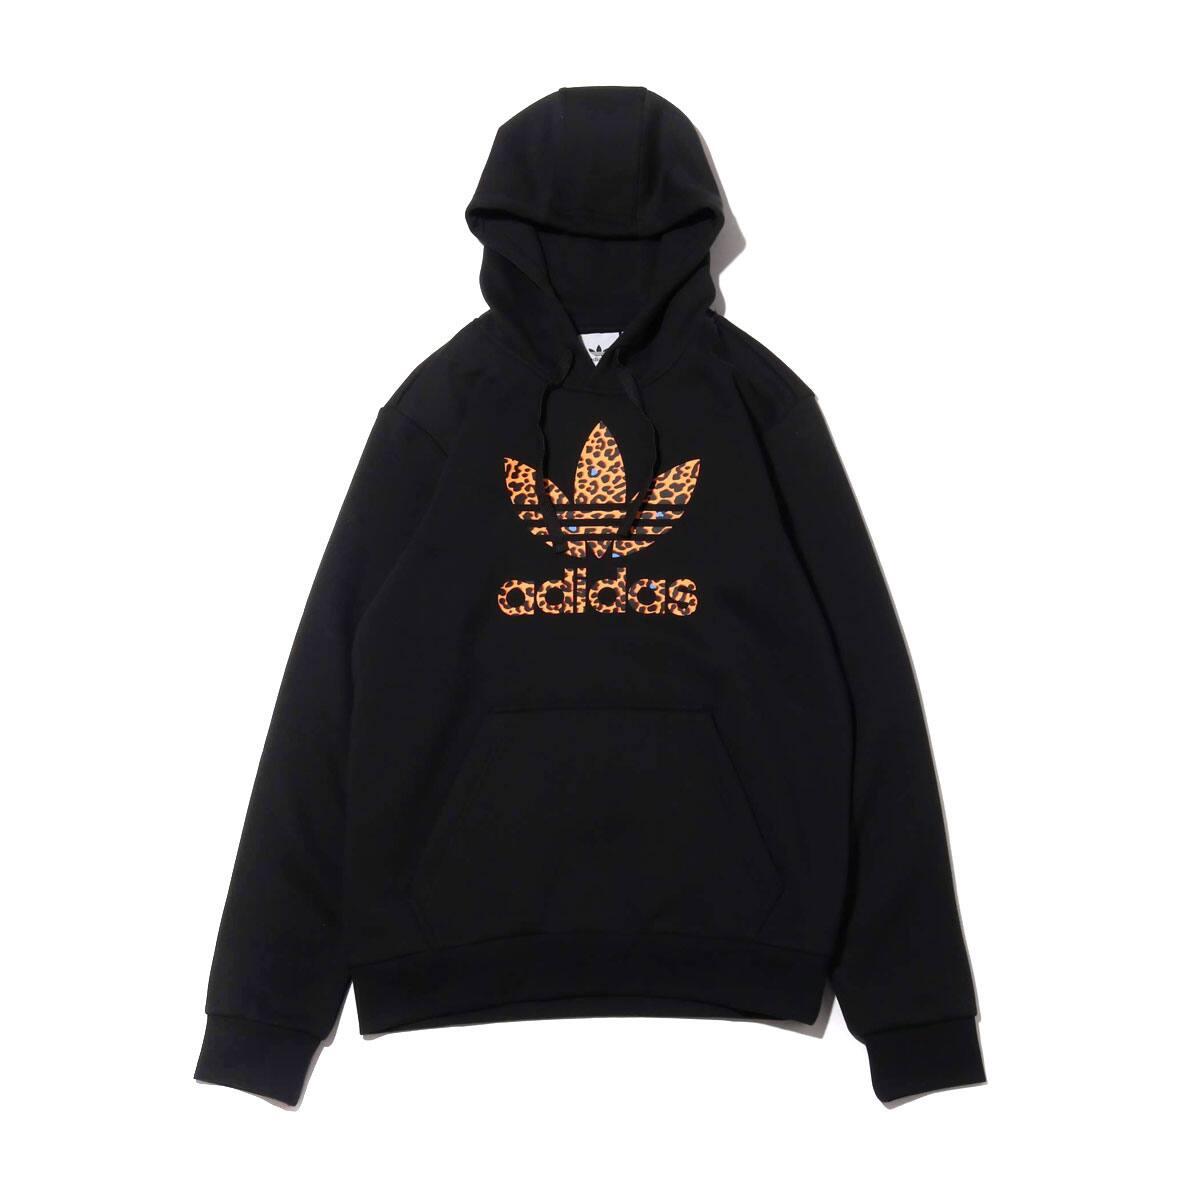 adidas LEPO TREFOIL HOODIE BLACK 19FW-I_photo_large